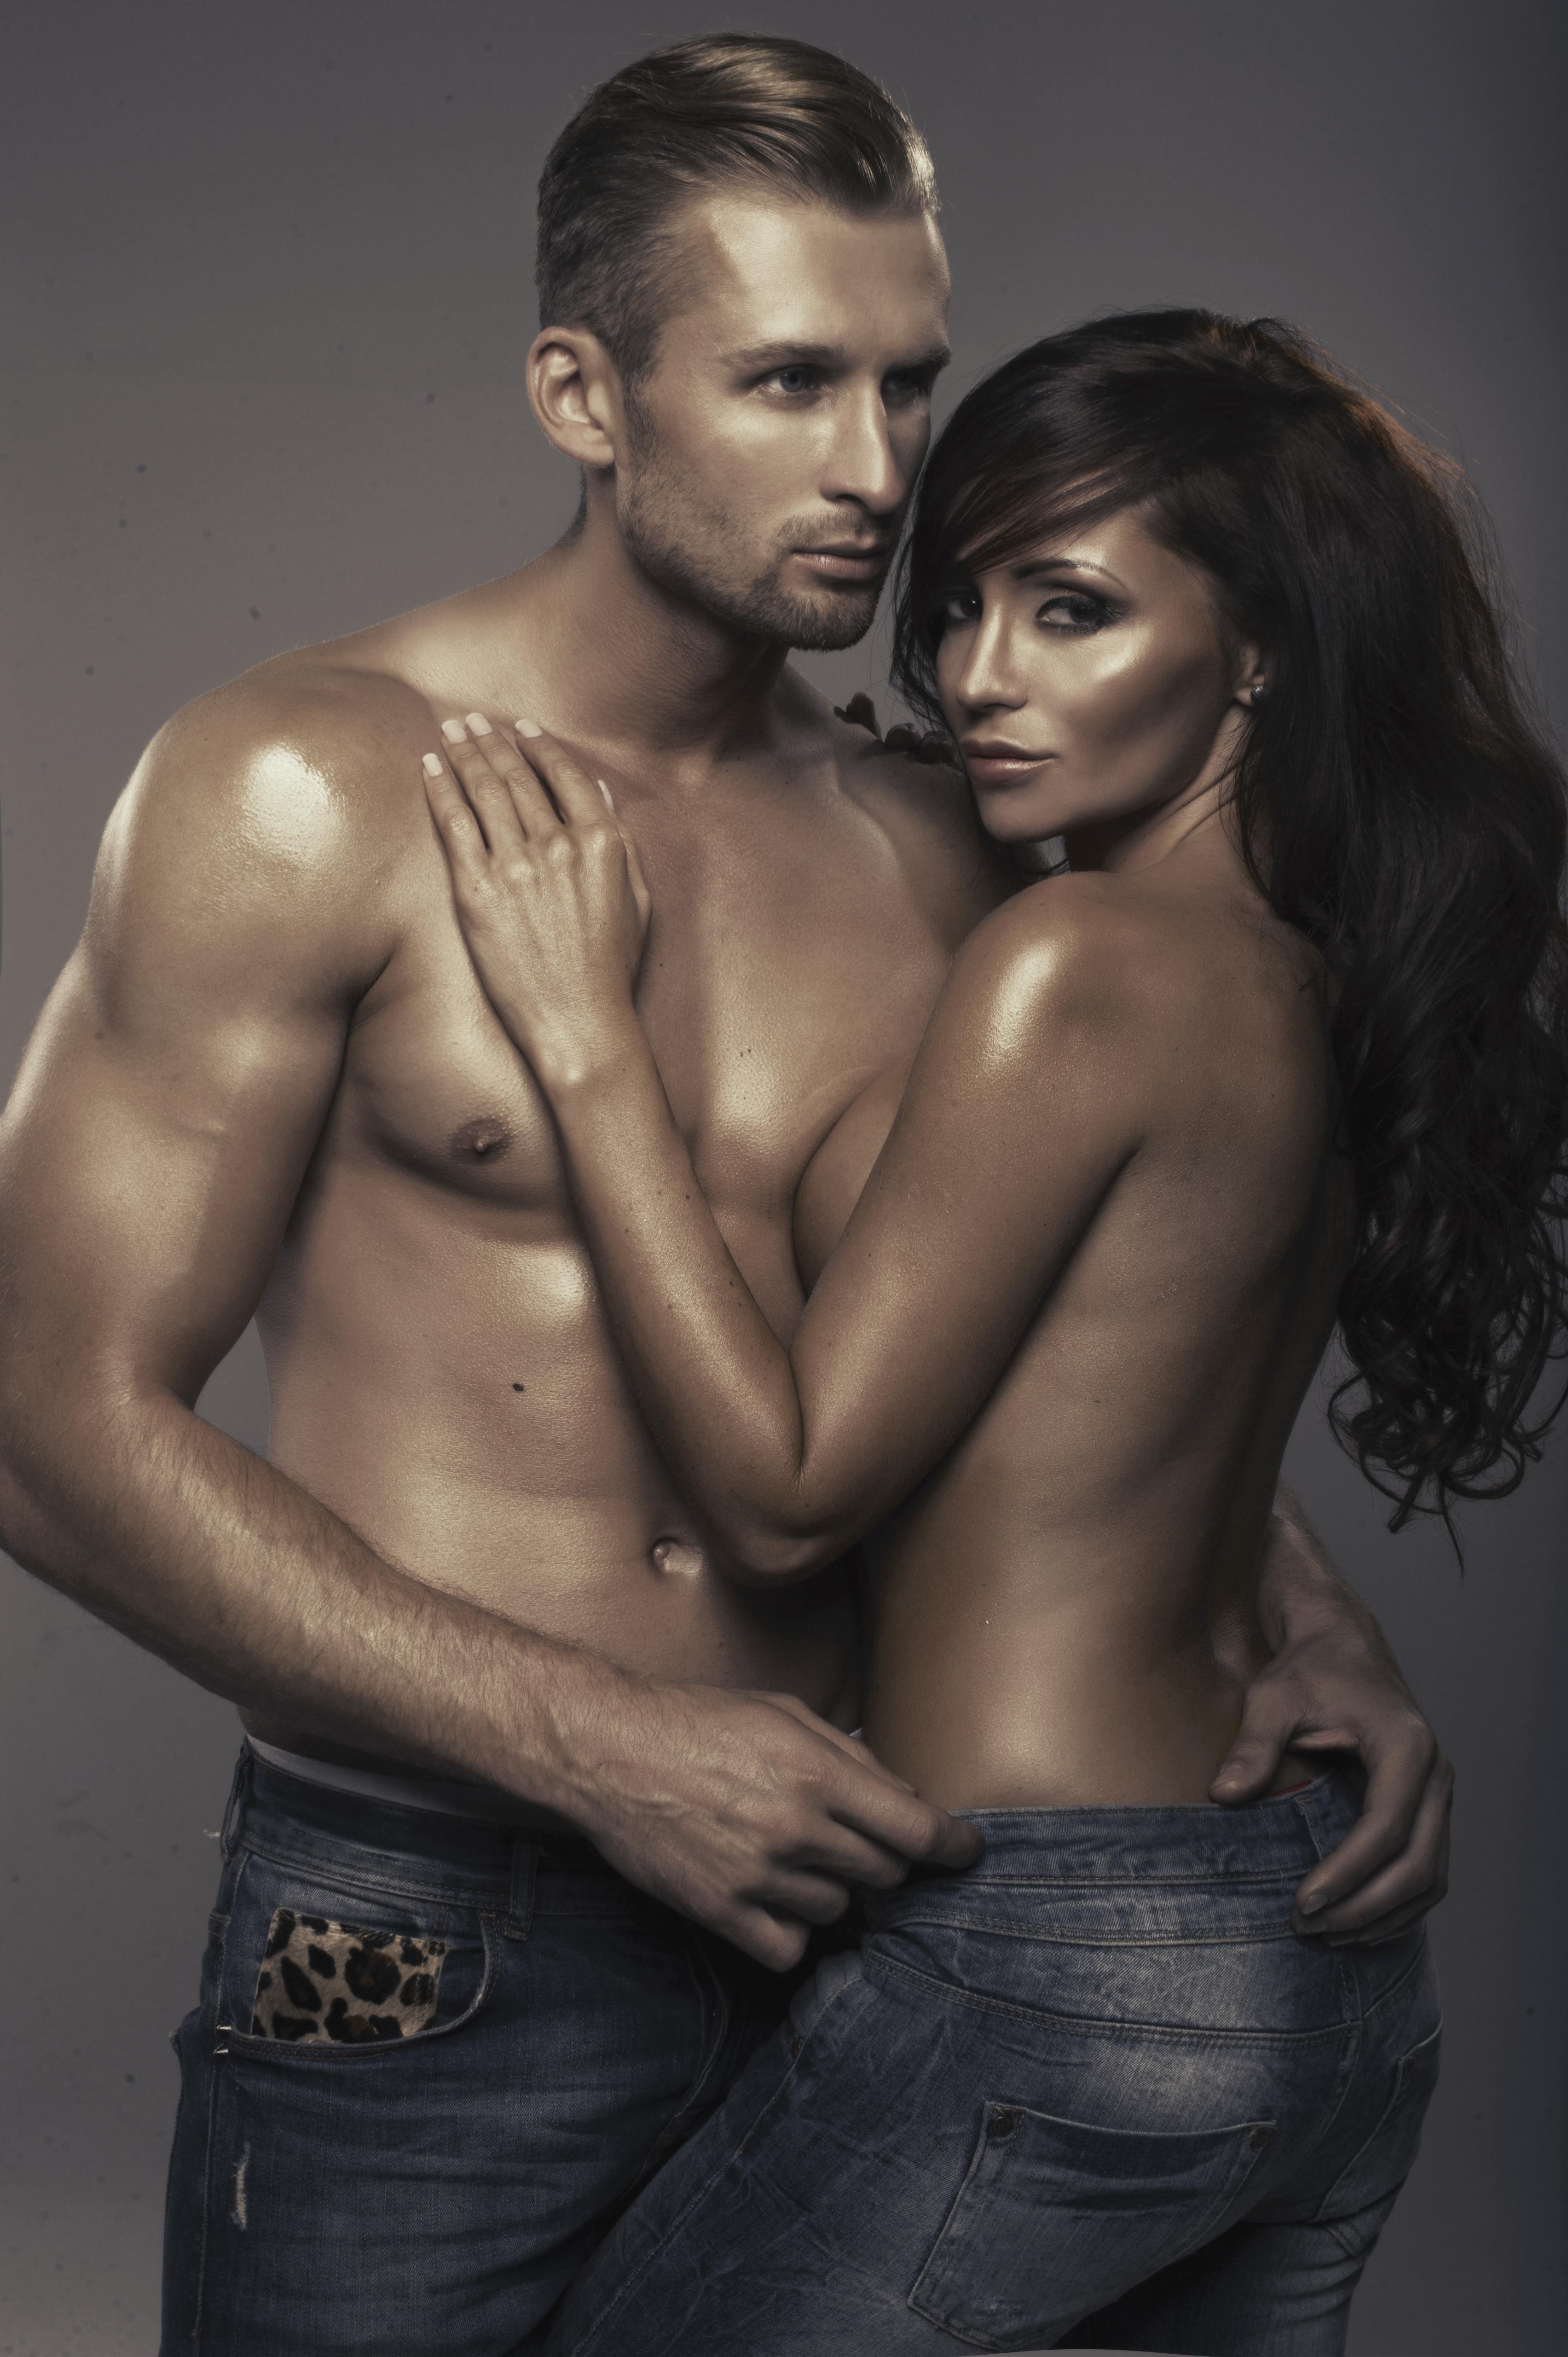 Эротические картинки мужчин и женщин — photo 6